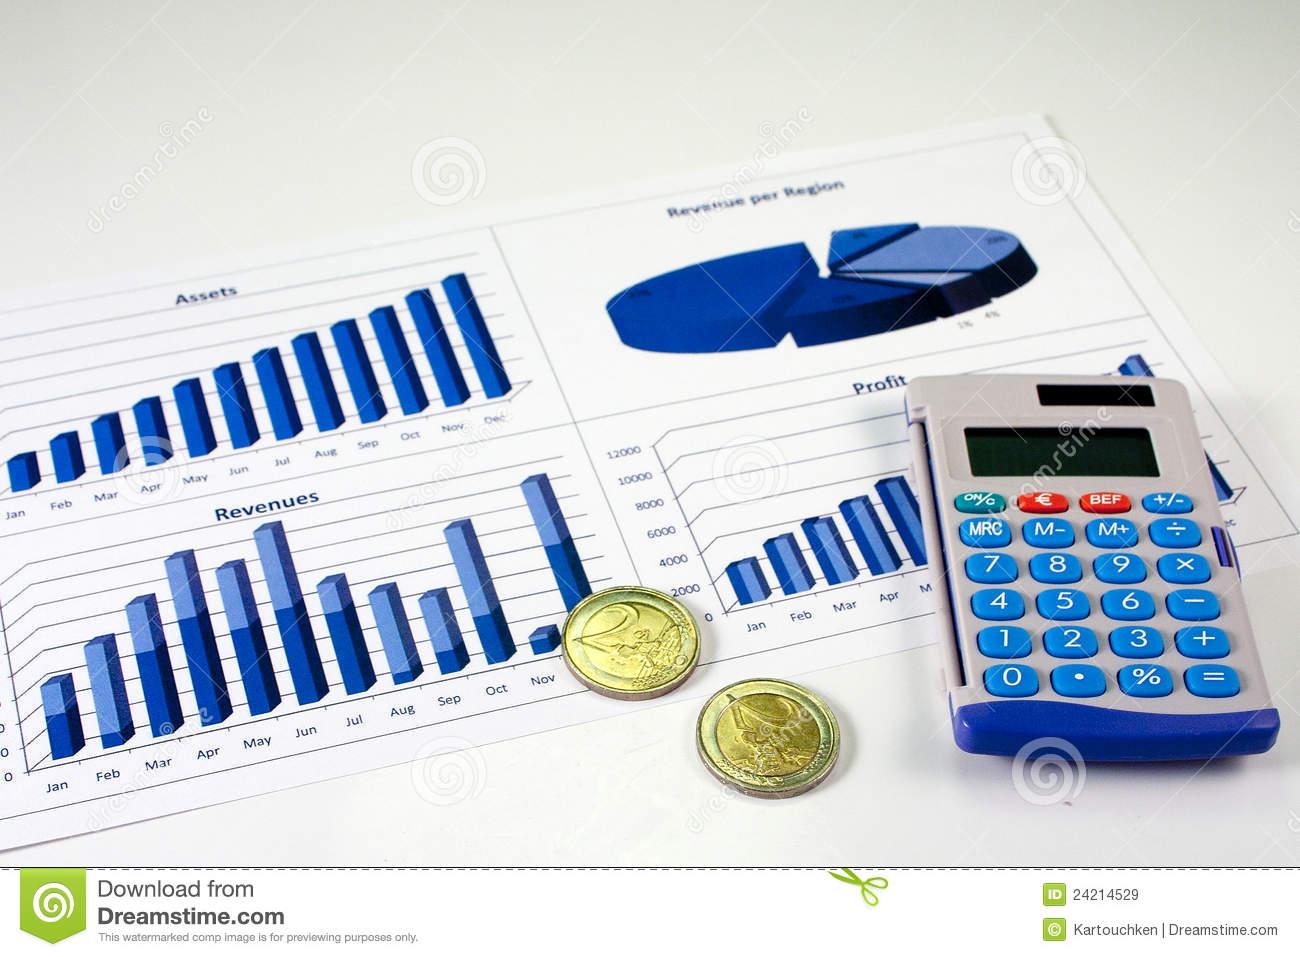 Financial Management Clipart - Clipart Kid